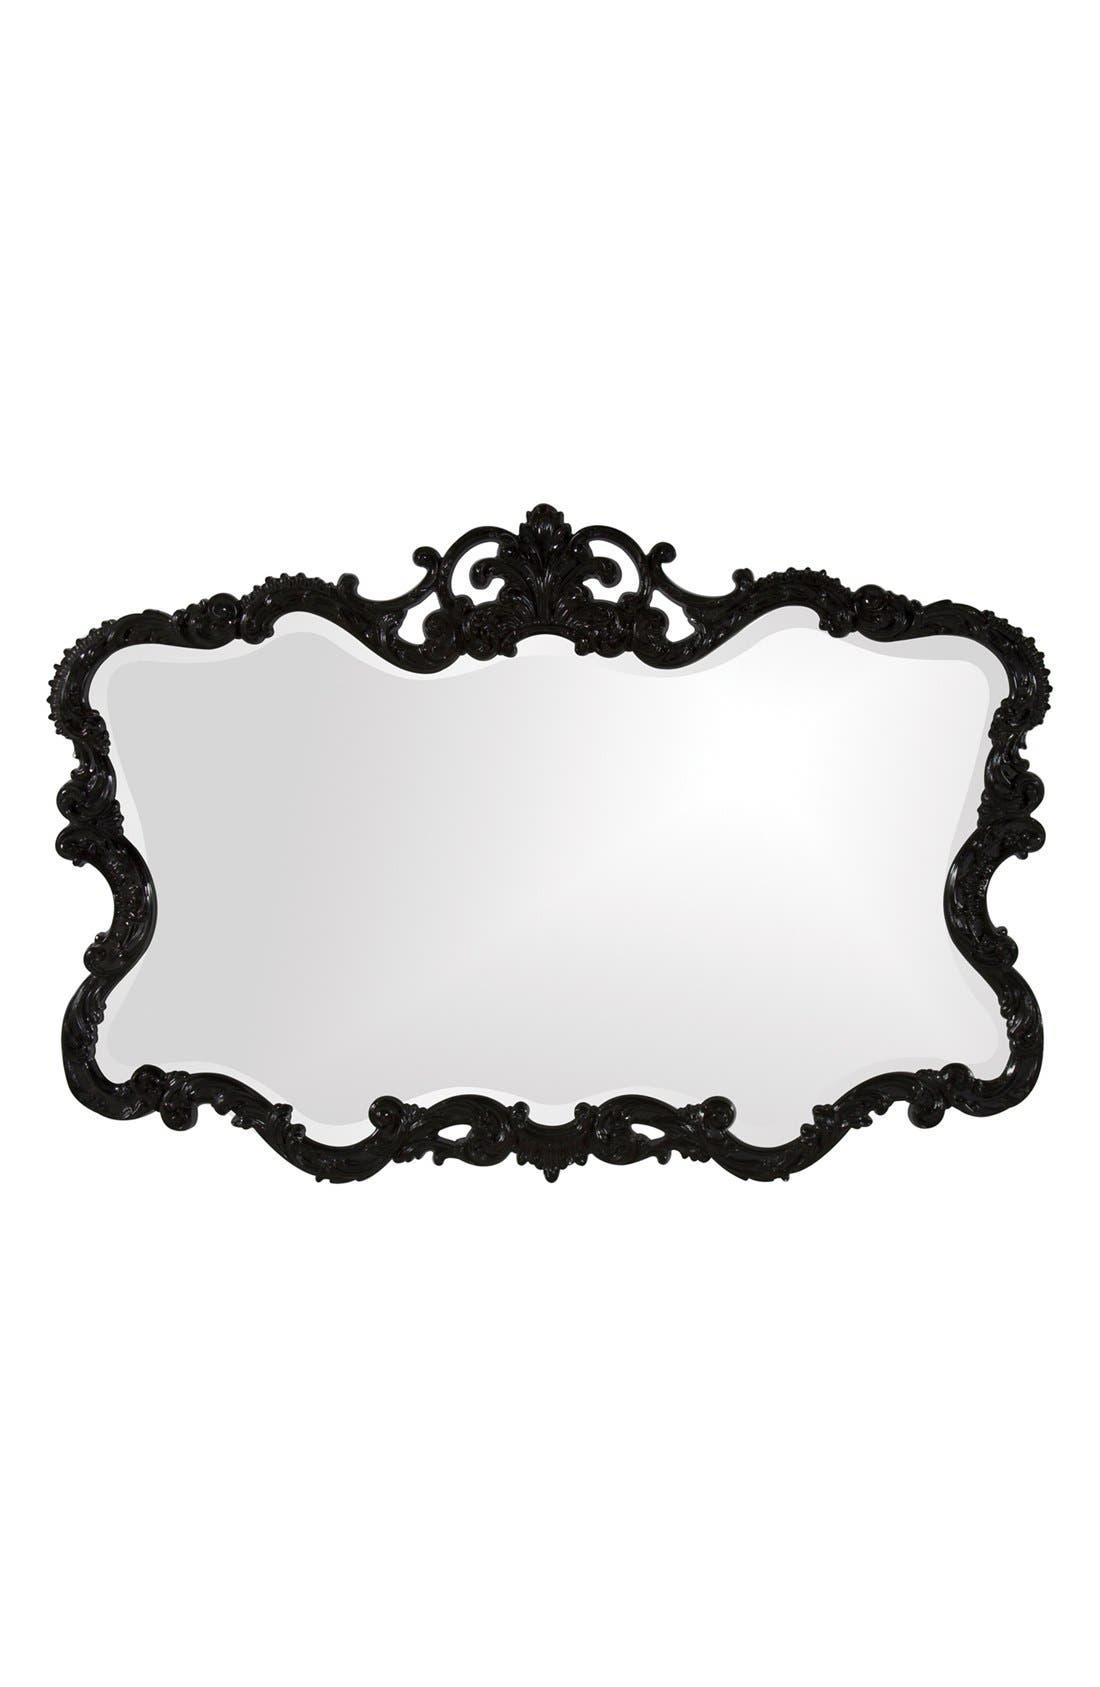 Alternate Image 1 Selected - Howard Elliott Collection 'Talida' Glossy Frame Mirror